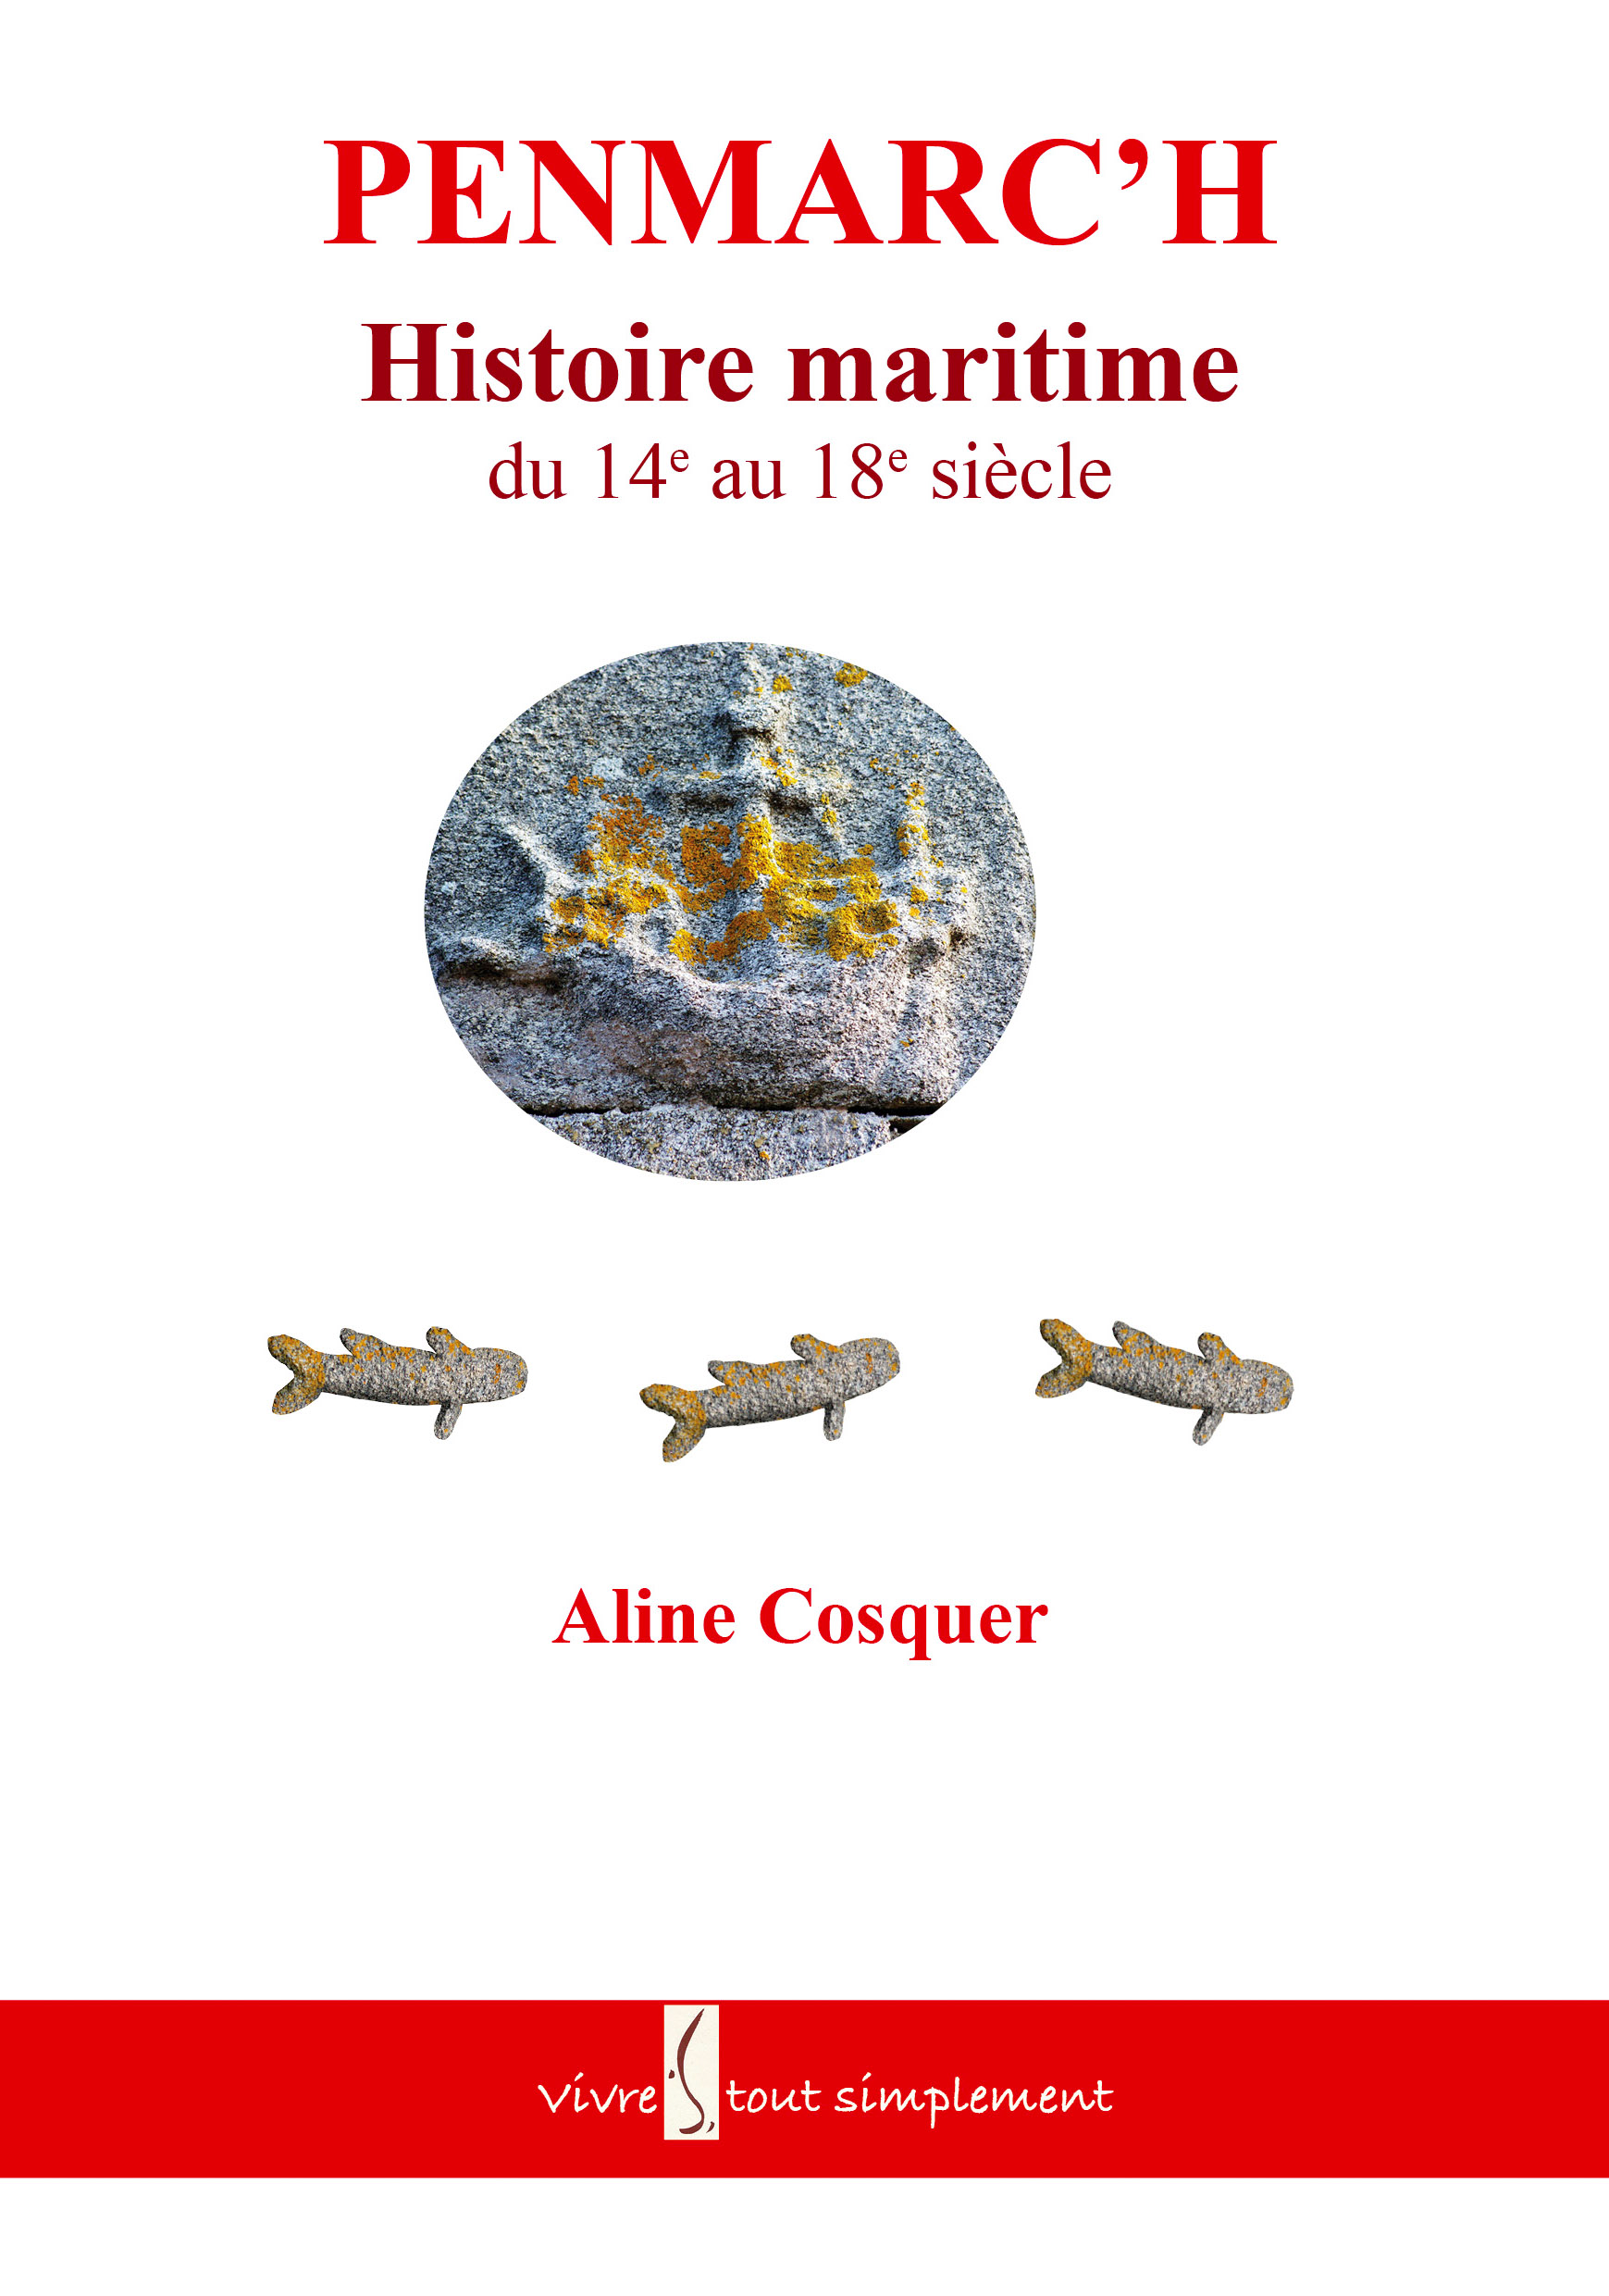 PENMARCH, histoire maritime